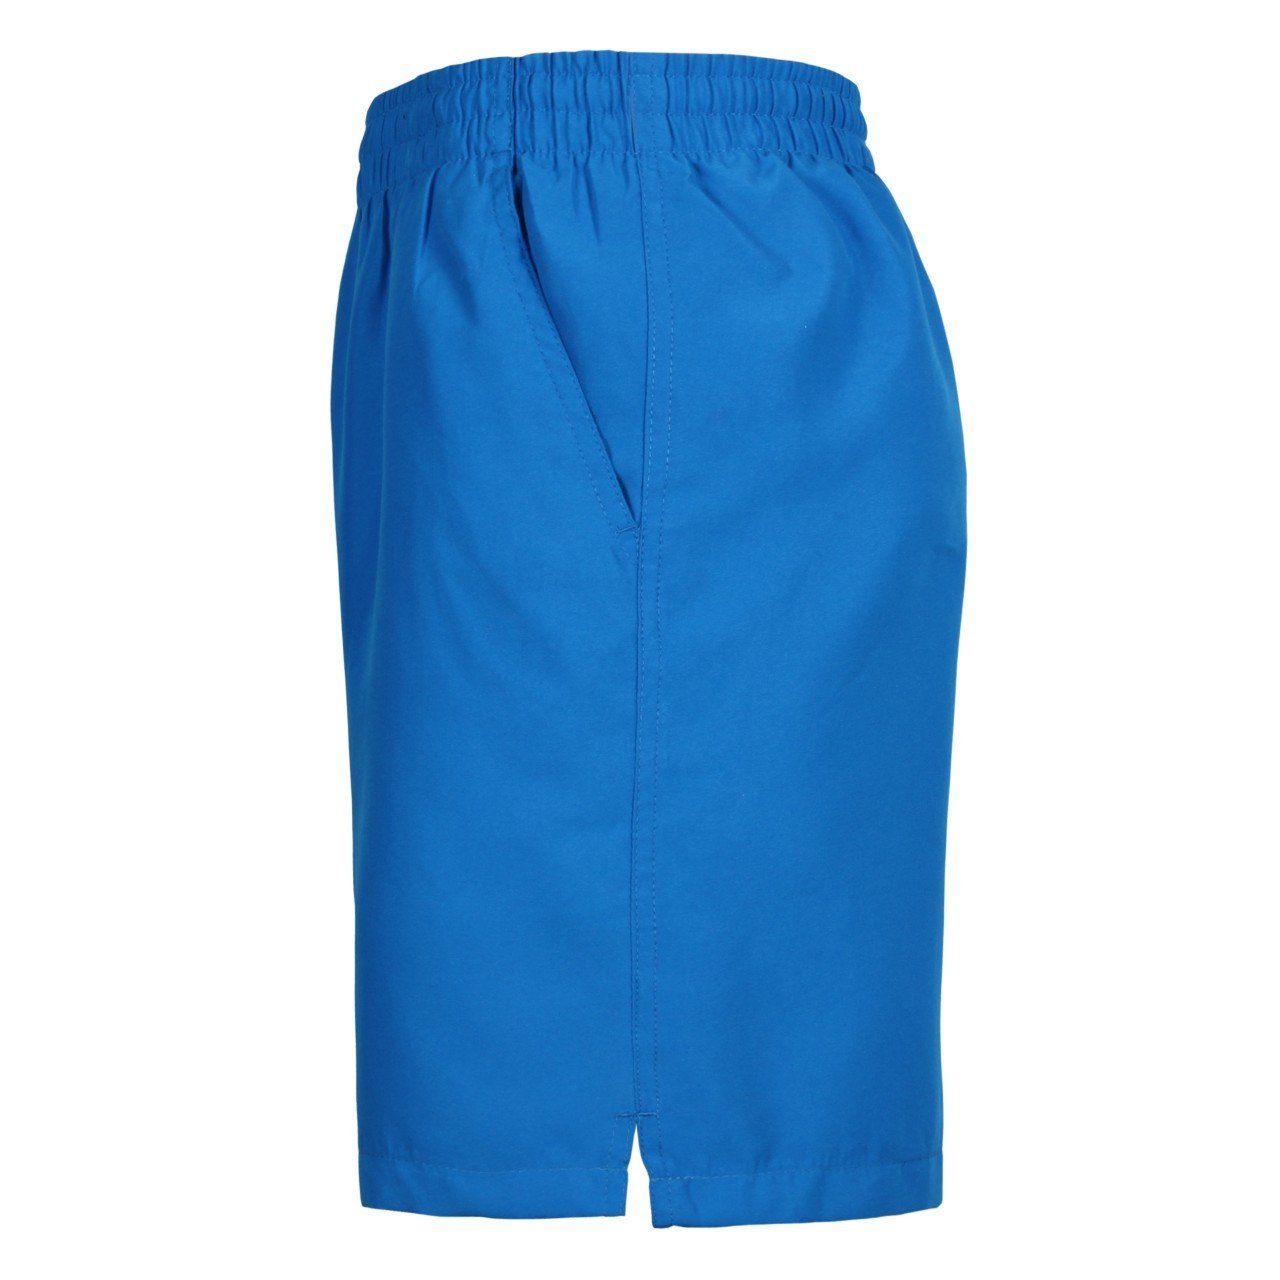 Sandole Watersport Mens Swim Trunk Short Suit//Classic